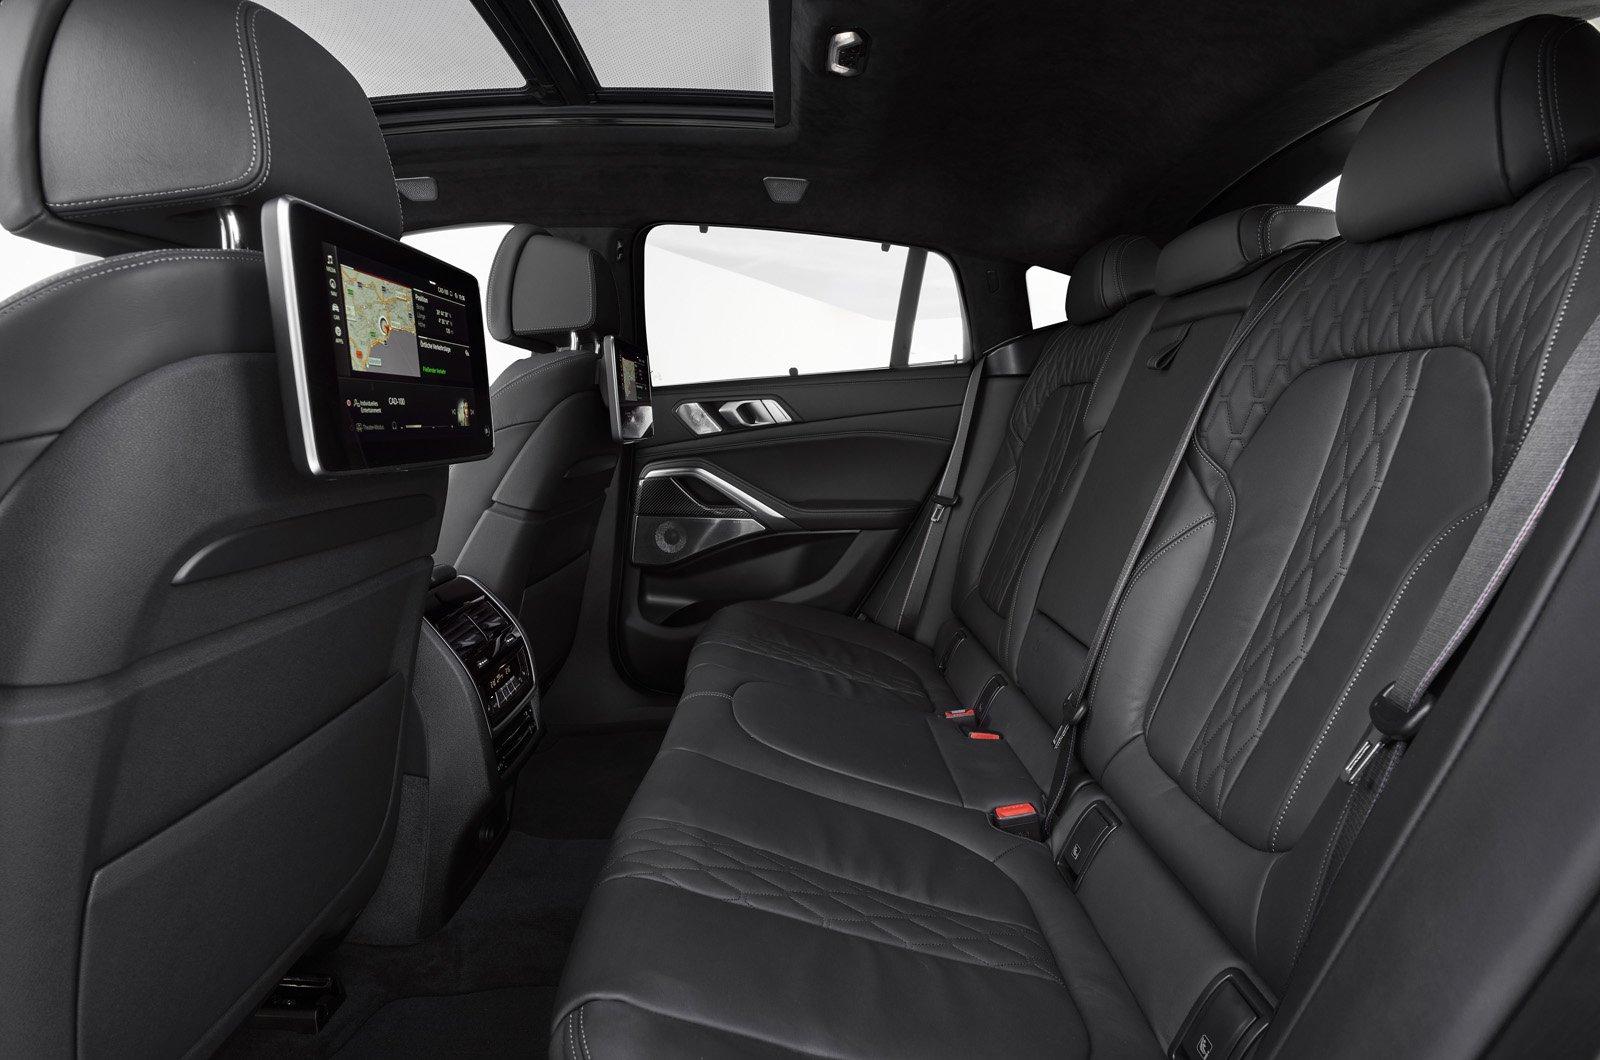 2020 BMW X6 rear seats